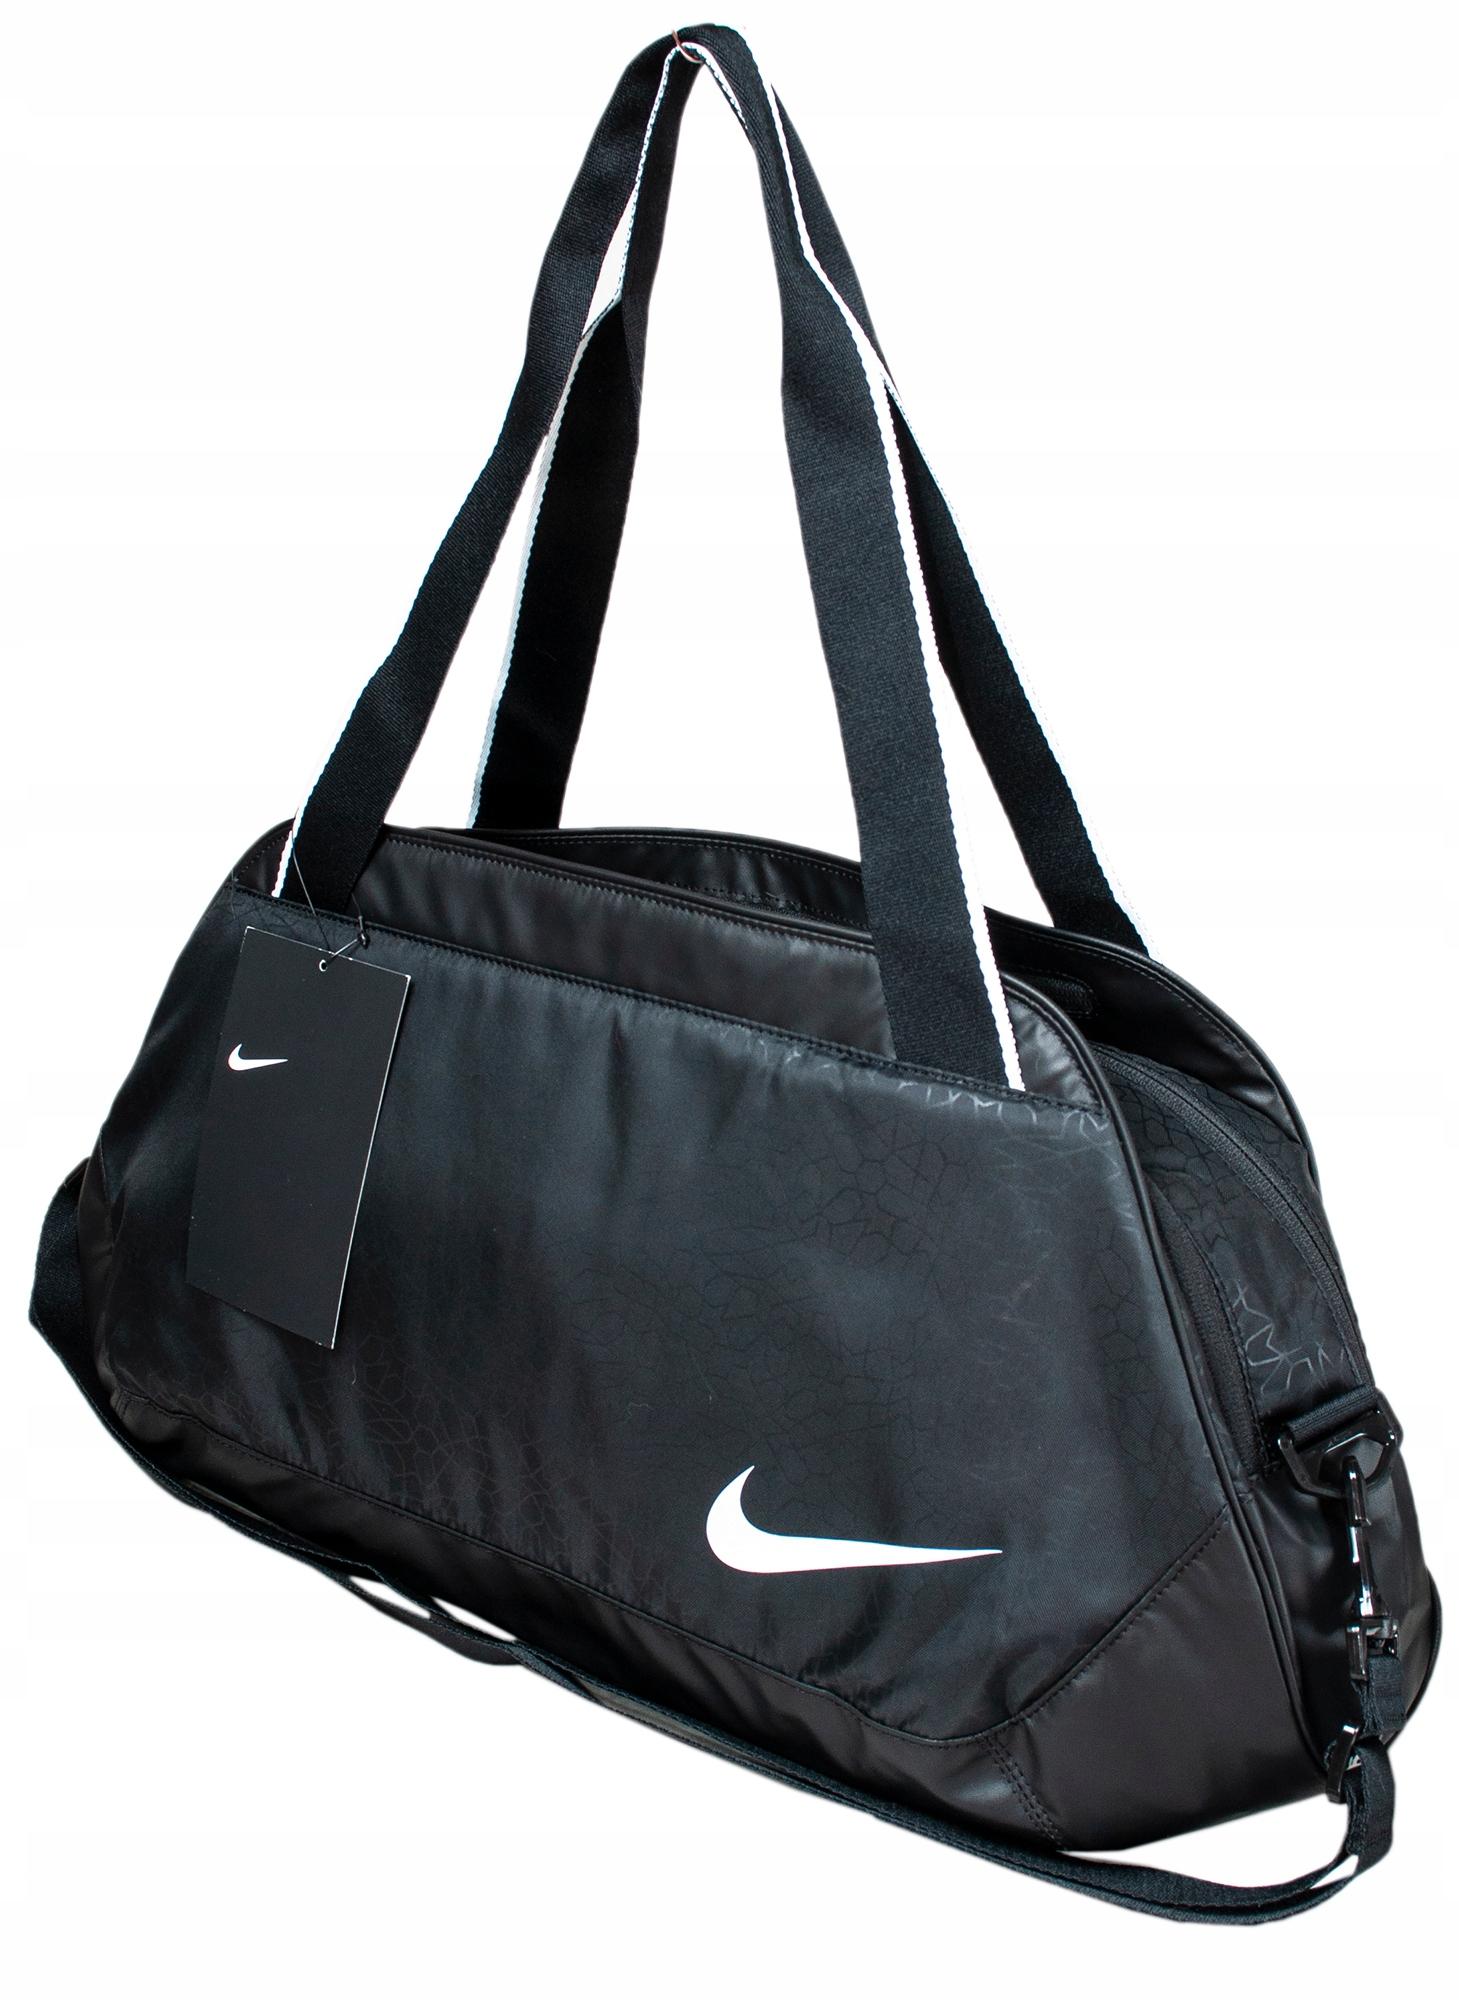 4c01940f7d8c1 NIKE idealna torba NA FITNESS siłownię basen - 7519892832 ...